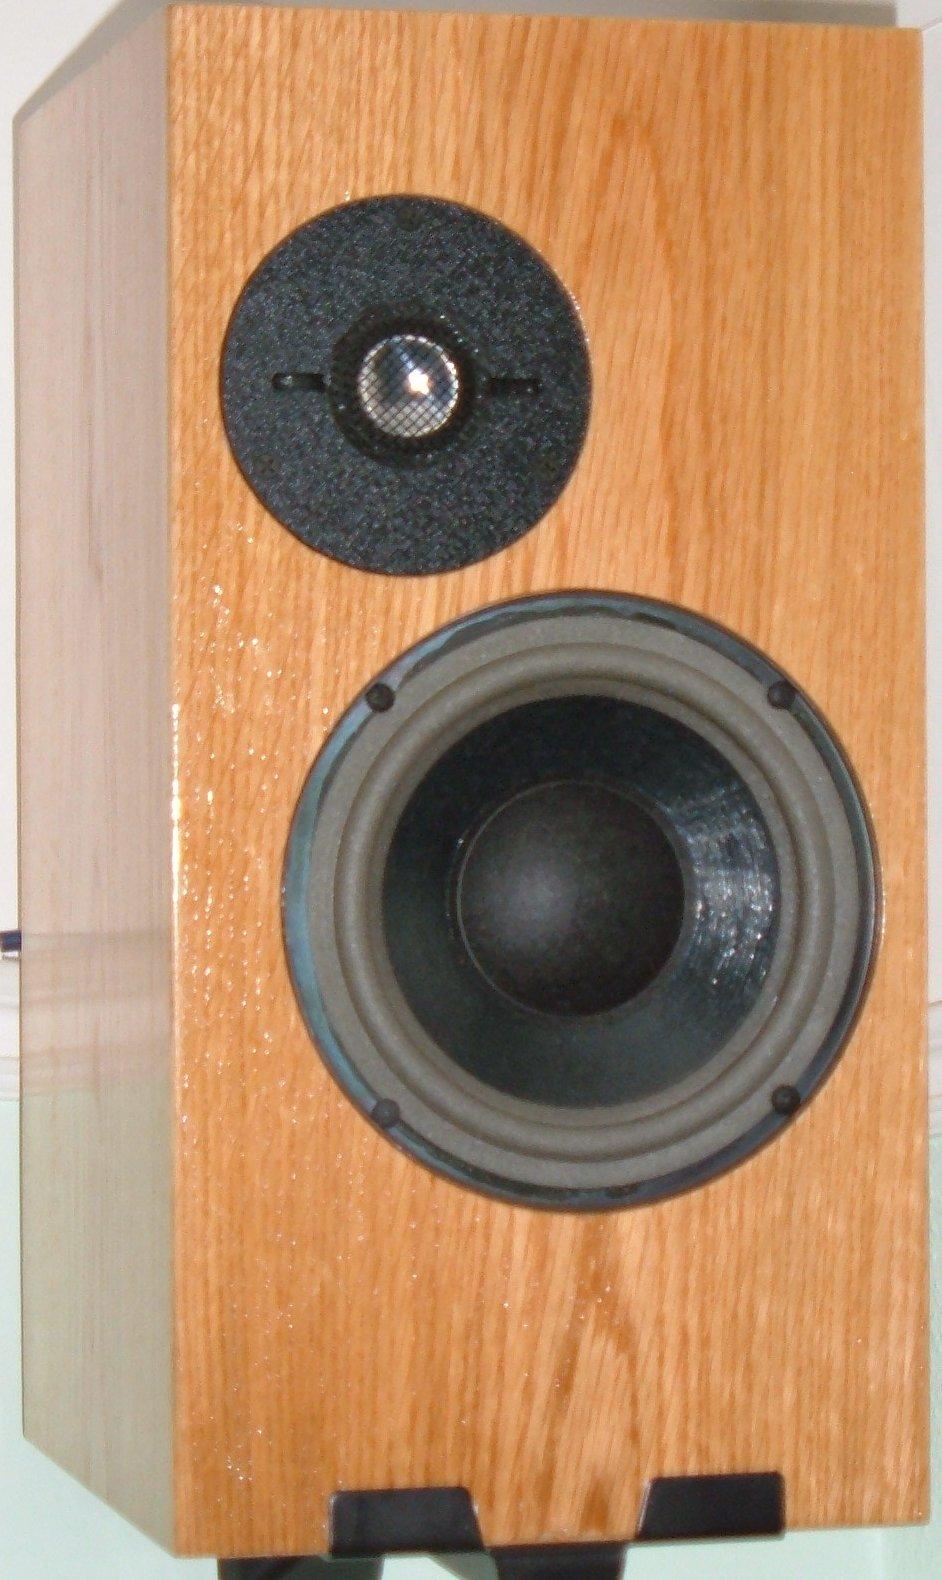 Human speakers do it yourself 61 kit photographs 1 solutioingenieria Gallery